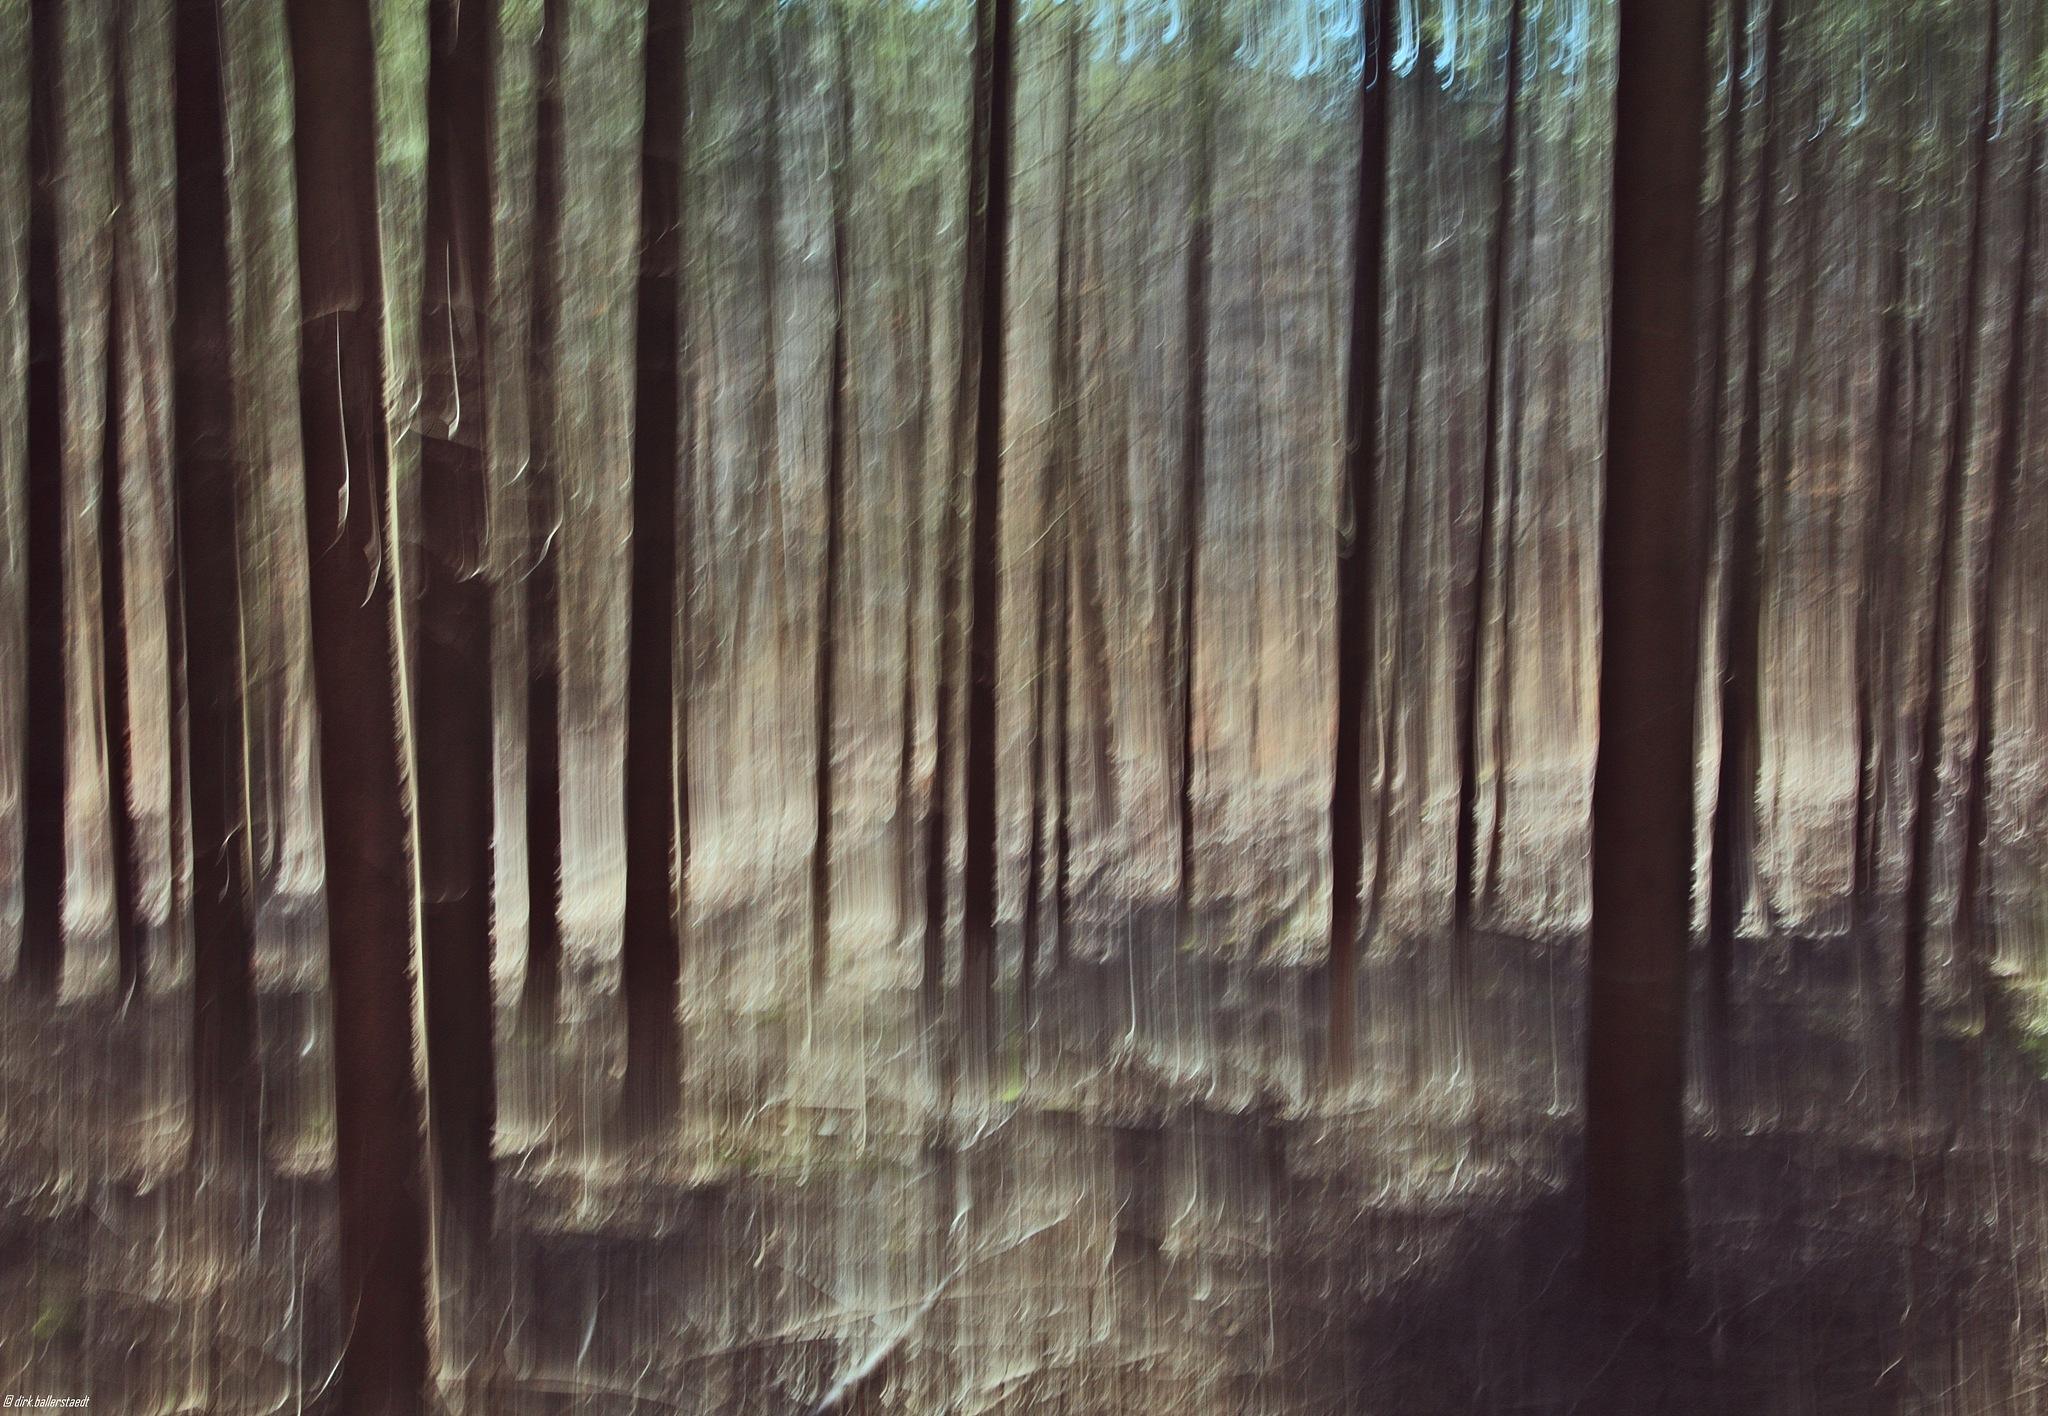 twisted II by rocksyou.photography